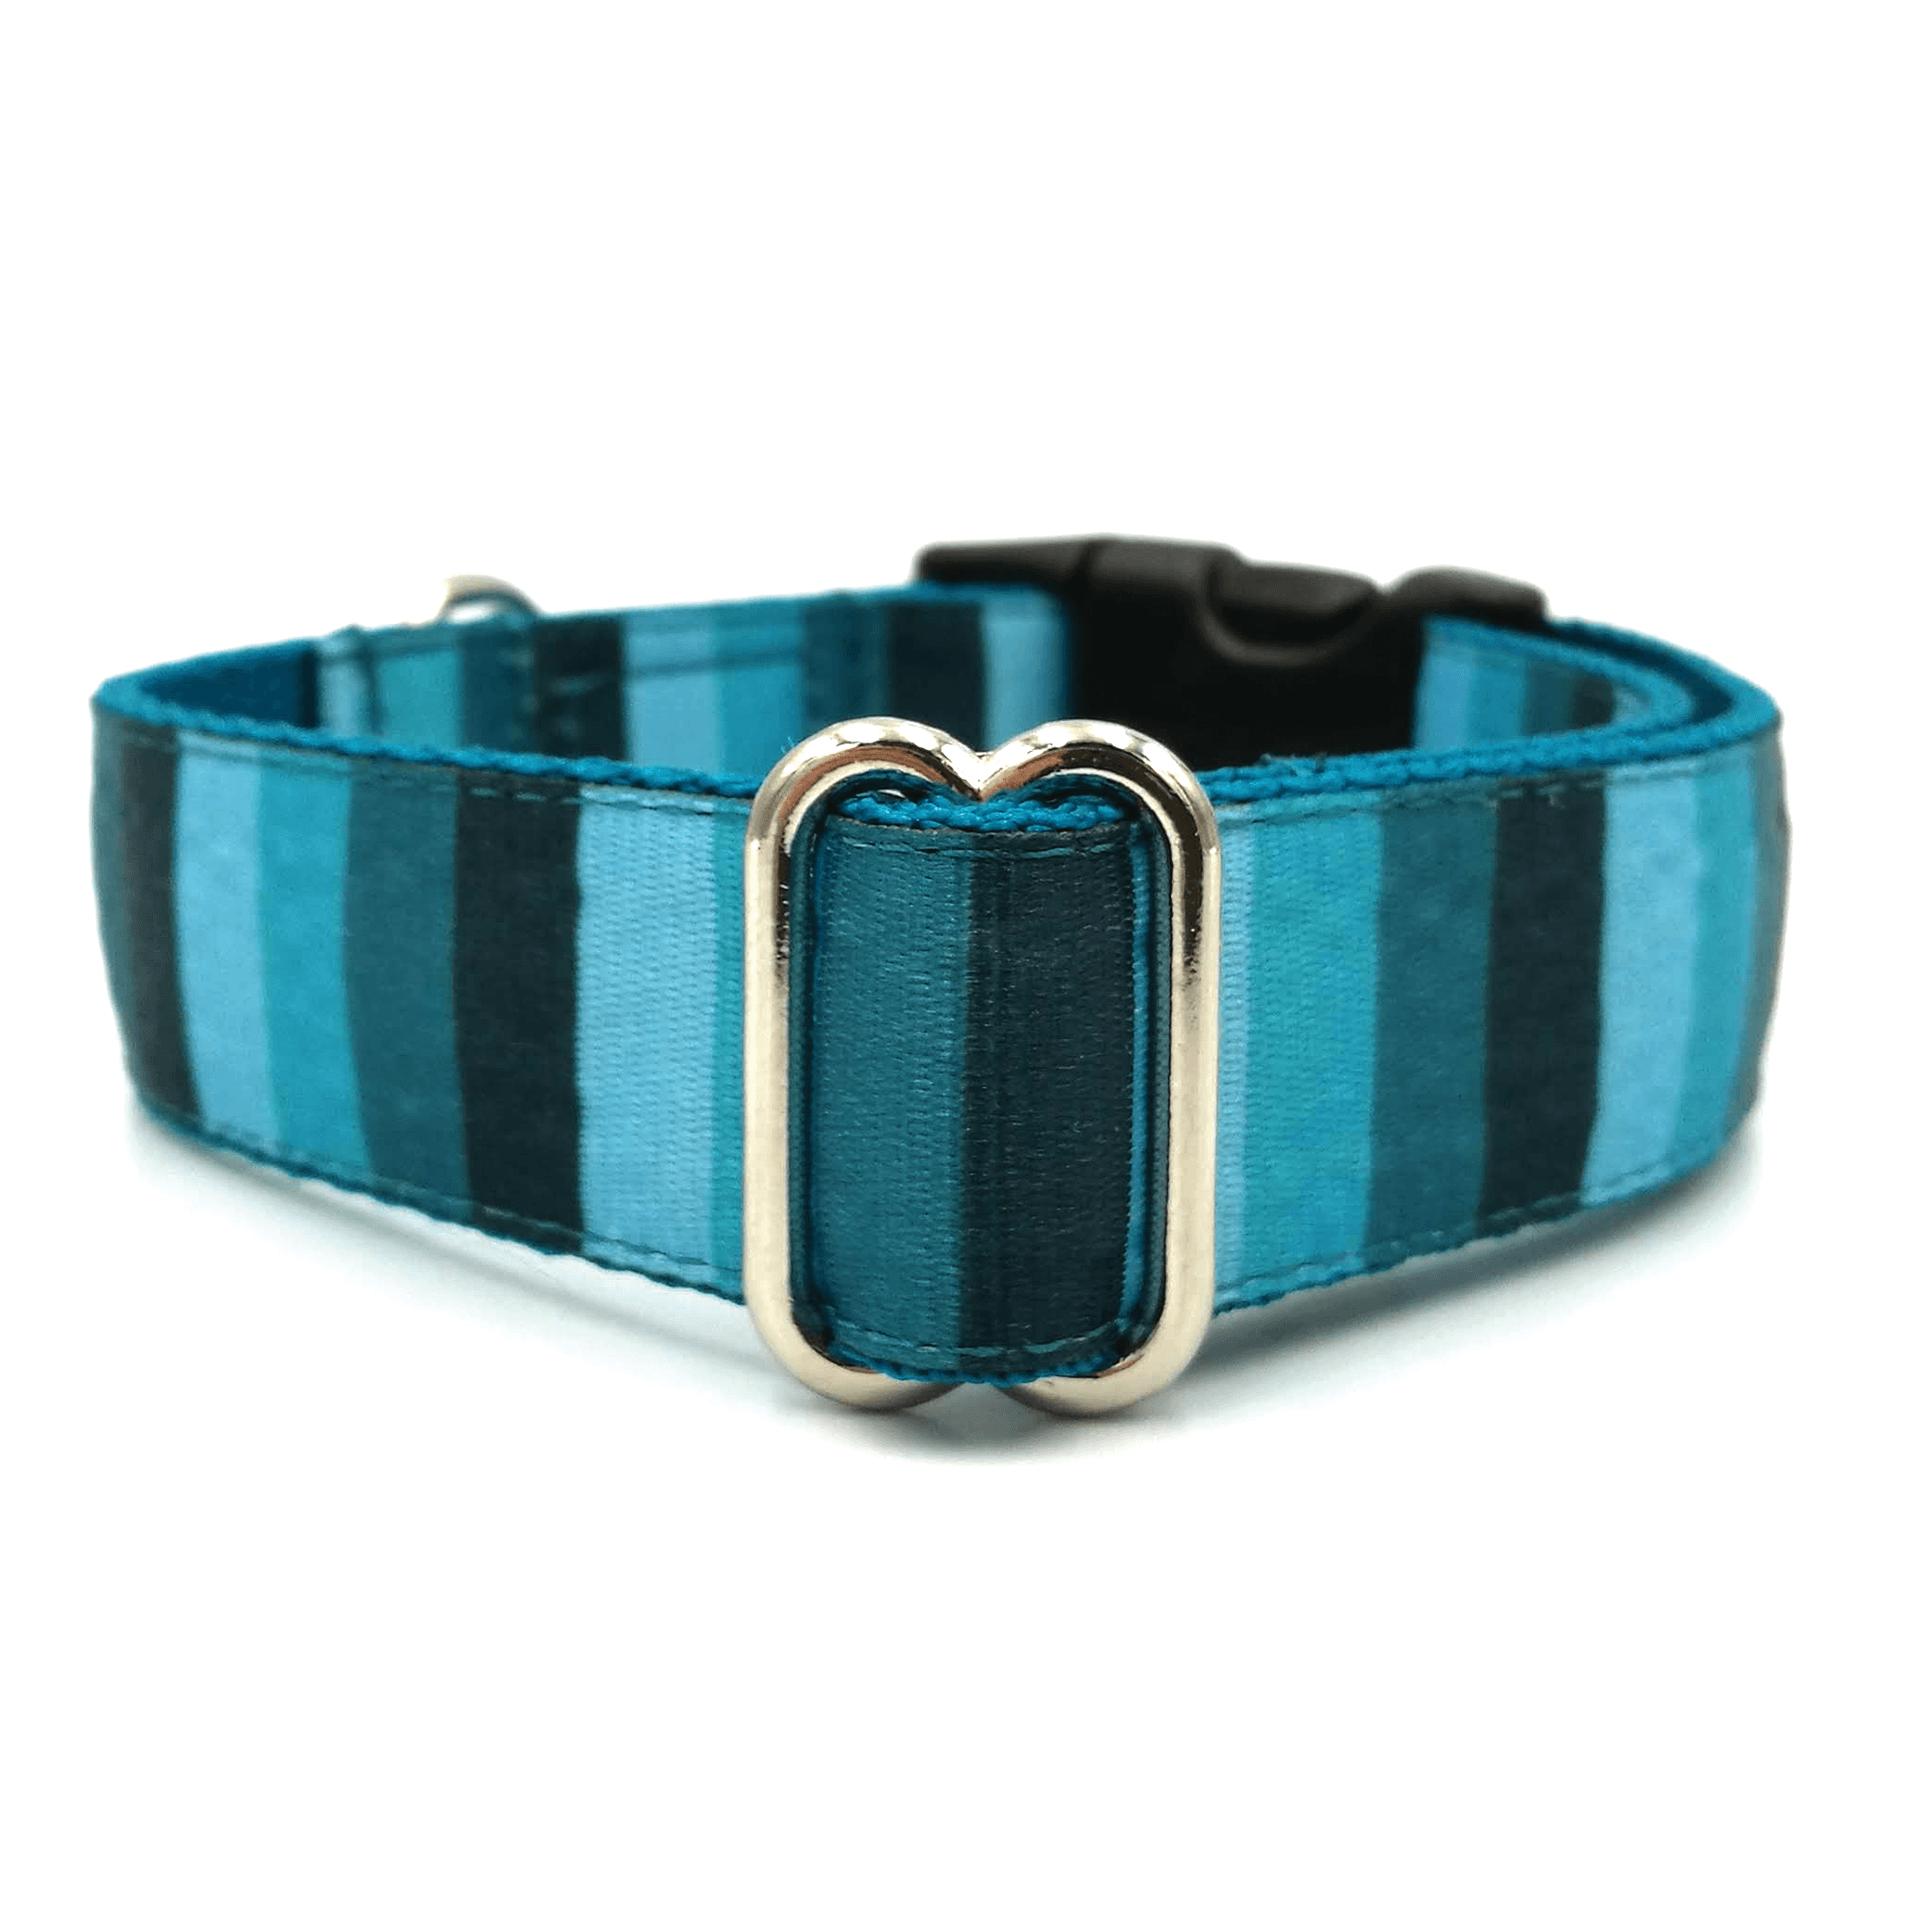 Blue striped dog collar